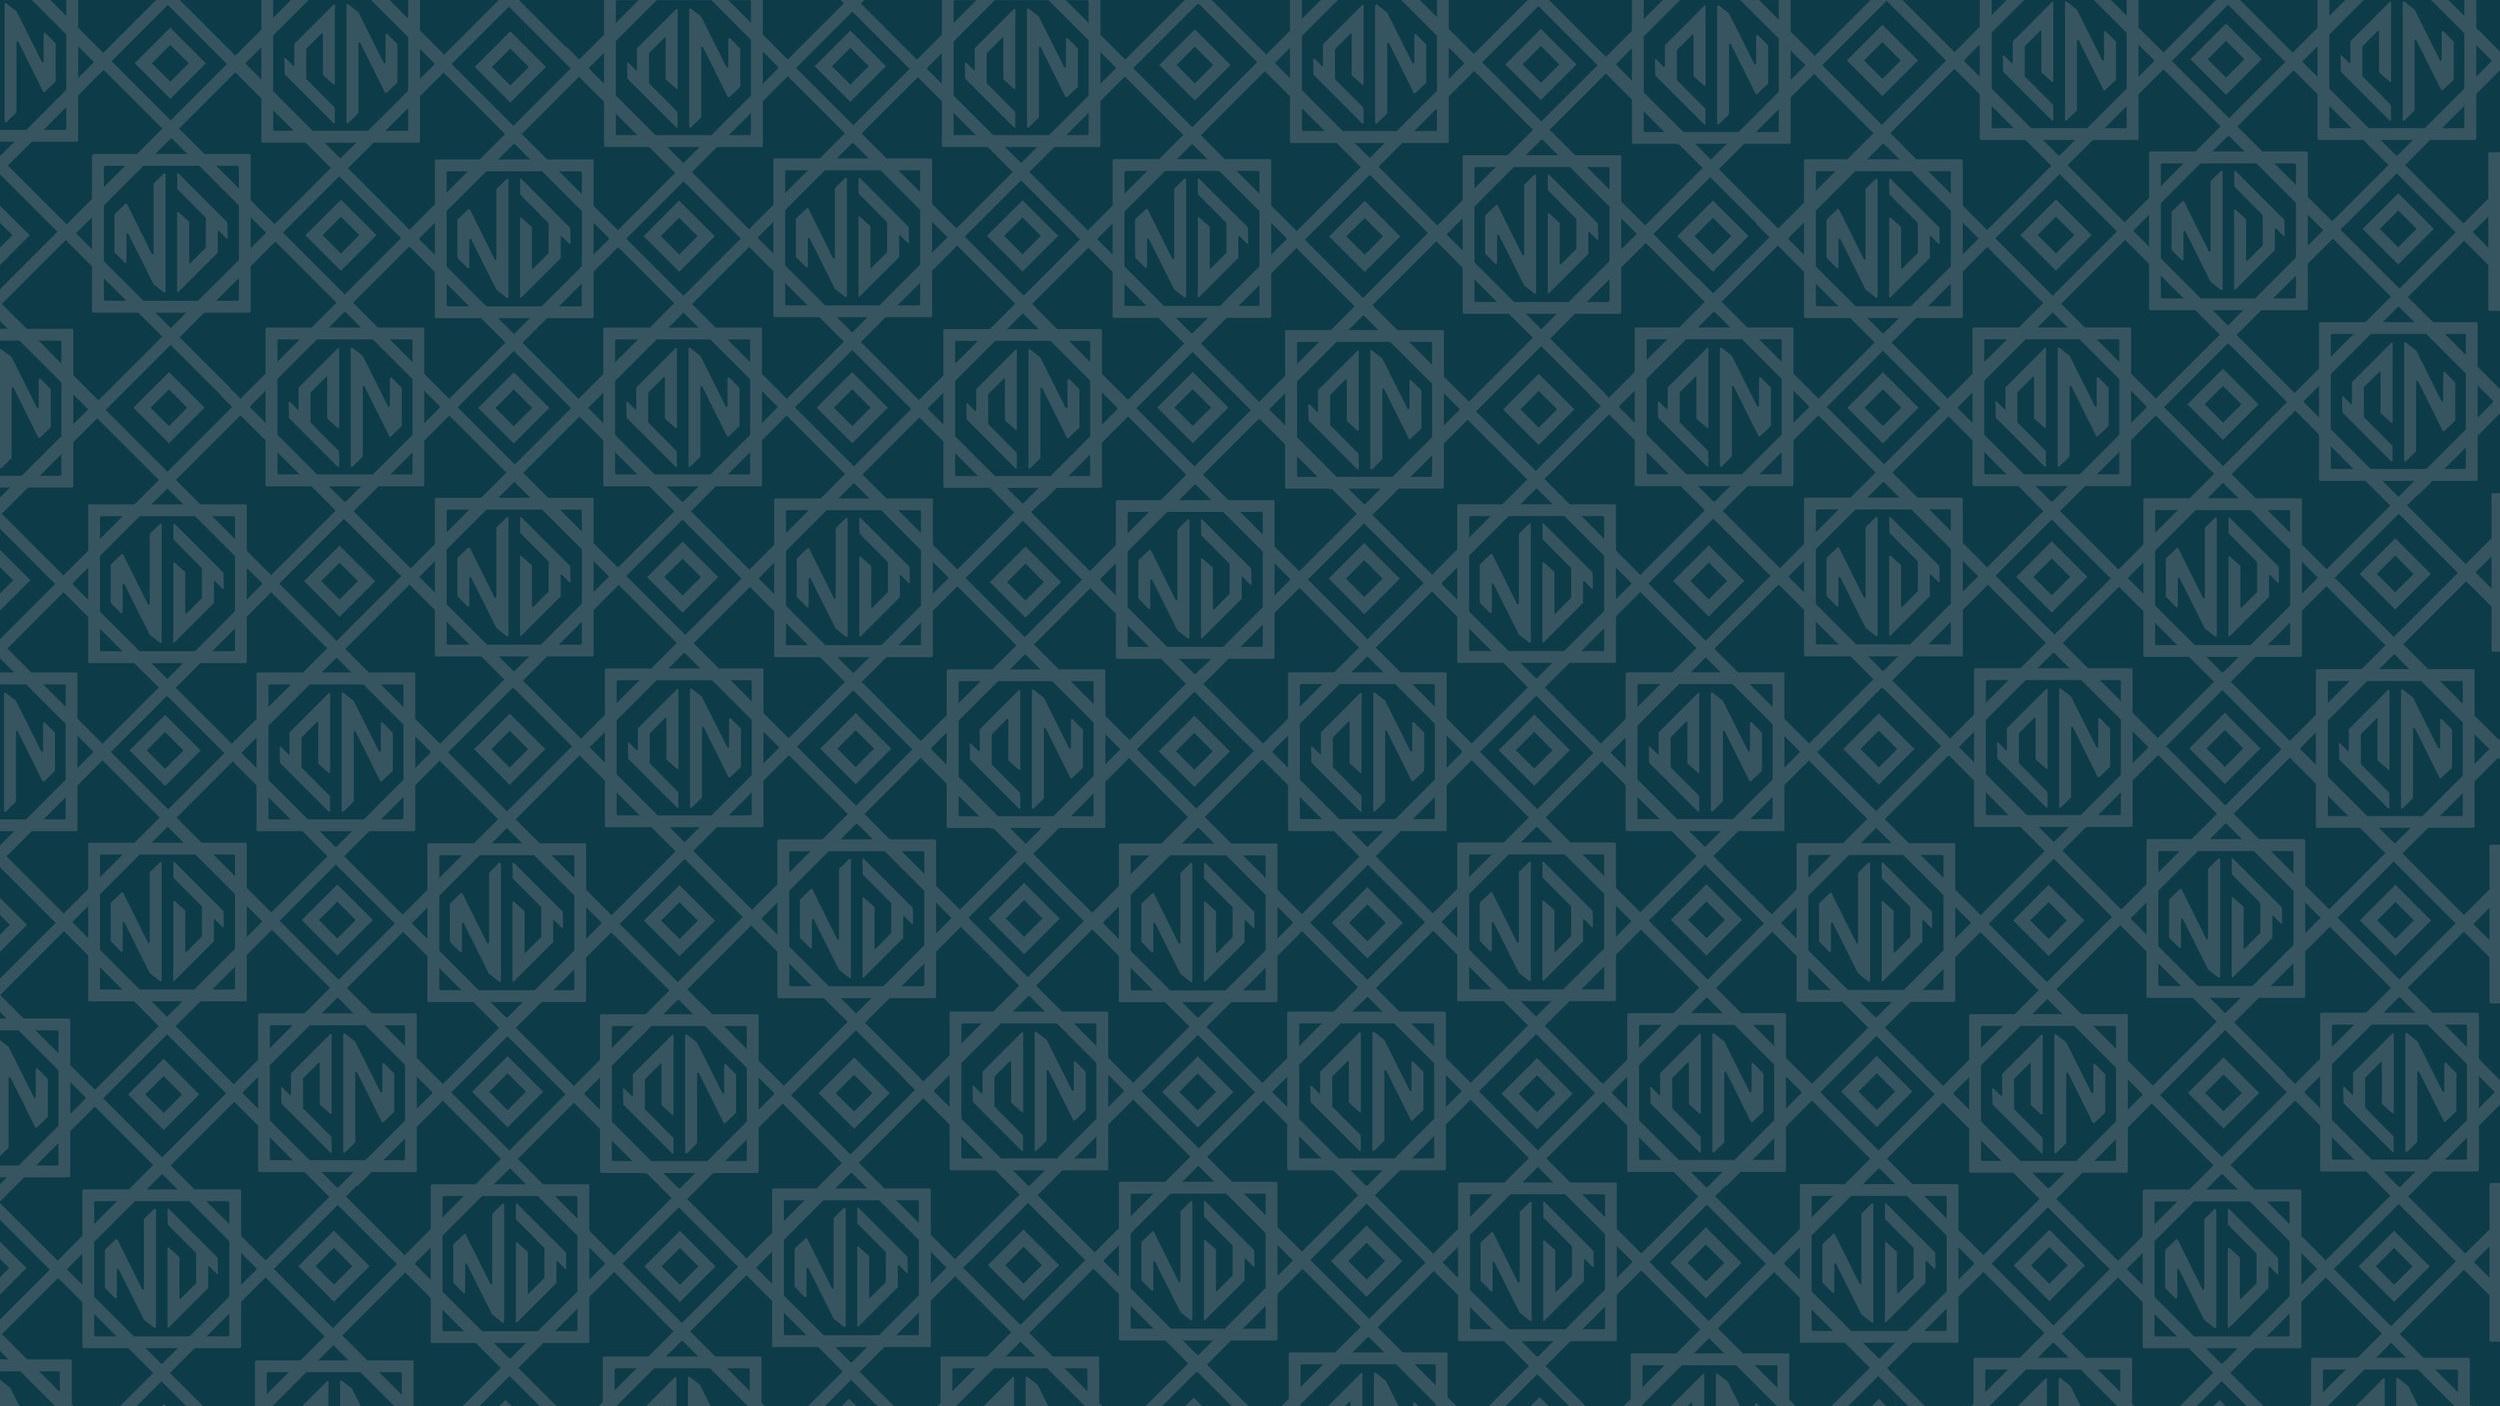 NobleJones_Pattern_Geometric-01.jpg